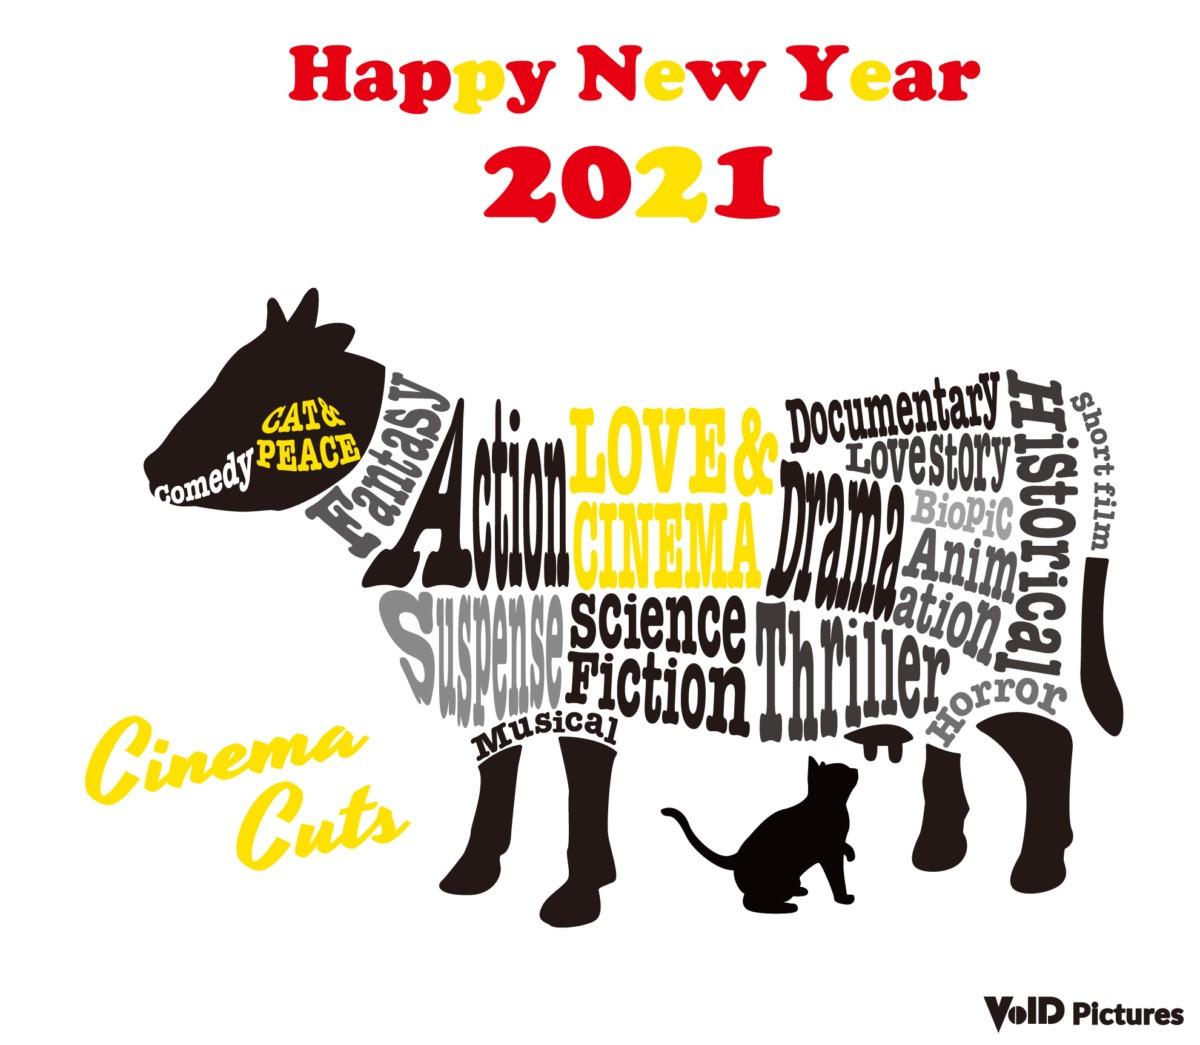 Happy New Year 2021,丑年、干支、謹賀新年、ハッピーニューイヤー2021、明けましておめでとうございます